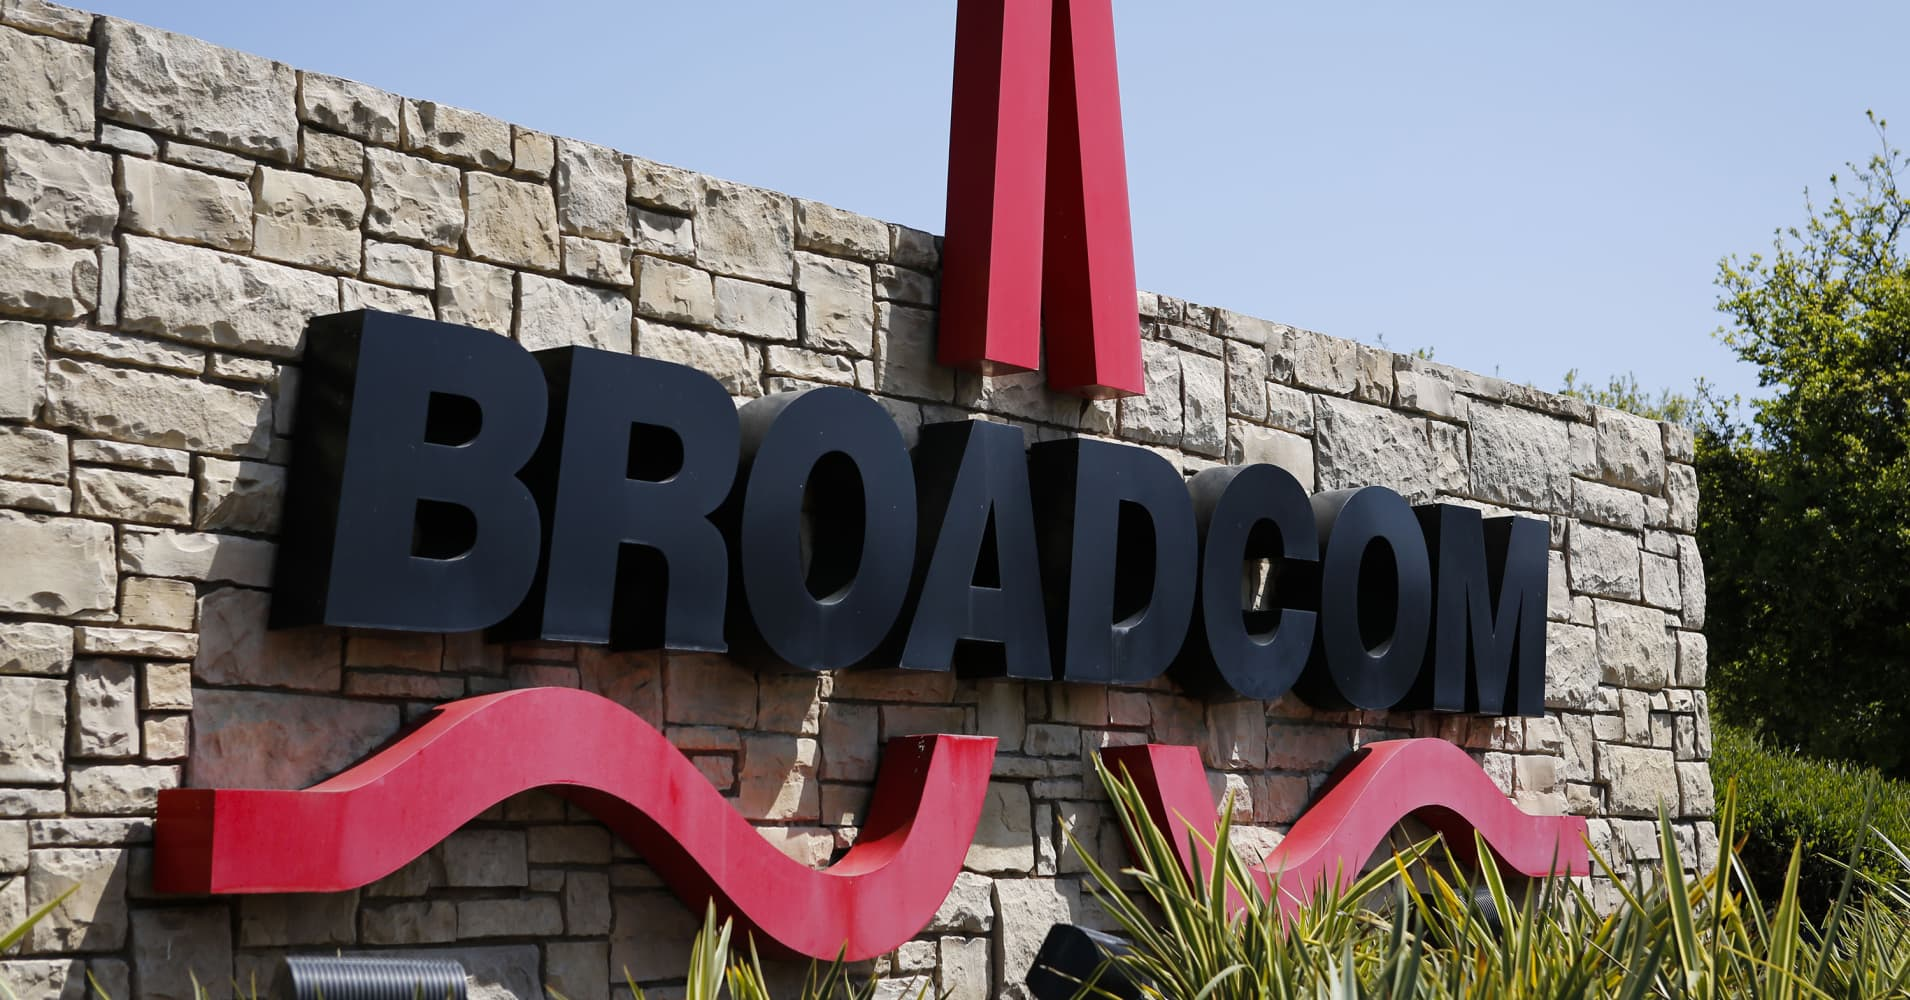 Broadcom is in talks to acquire Symantec